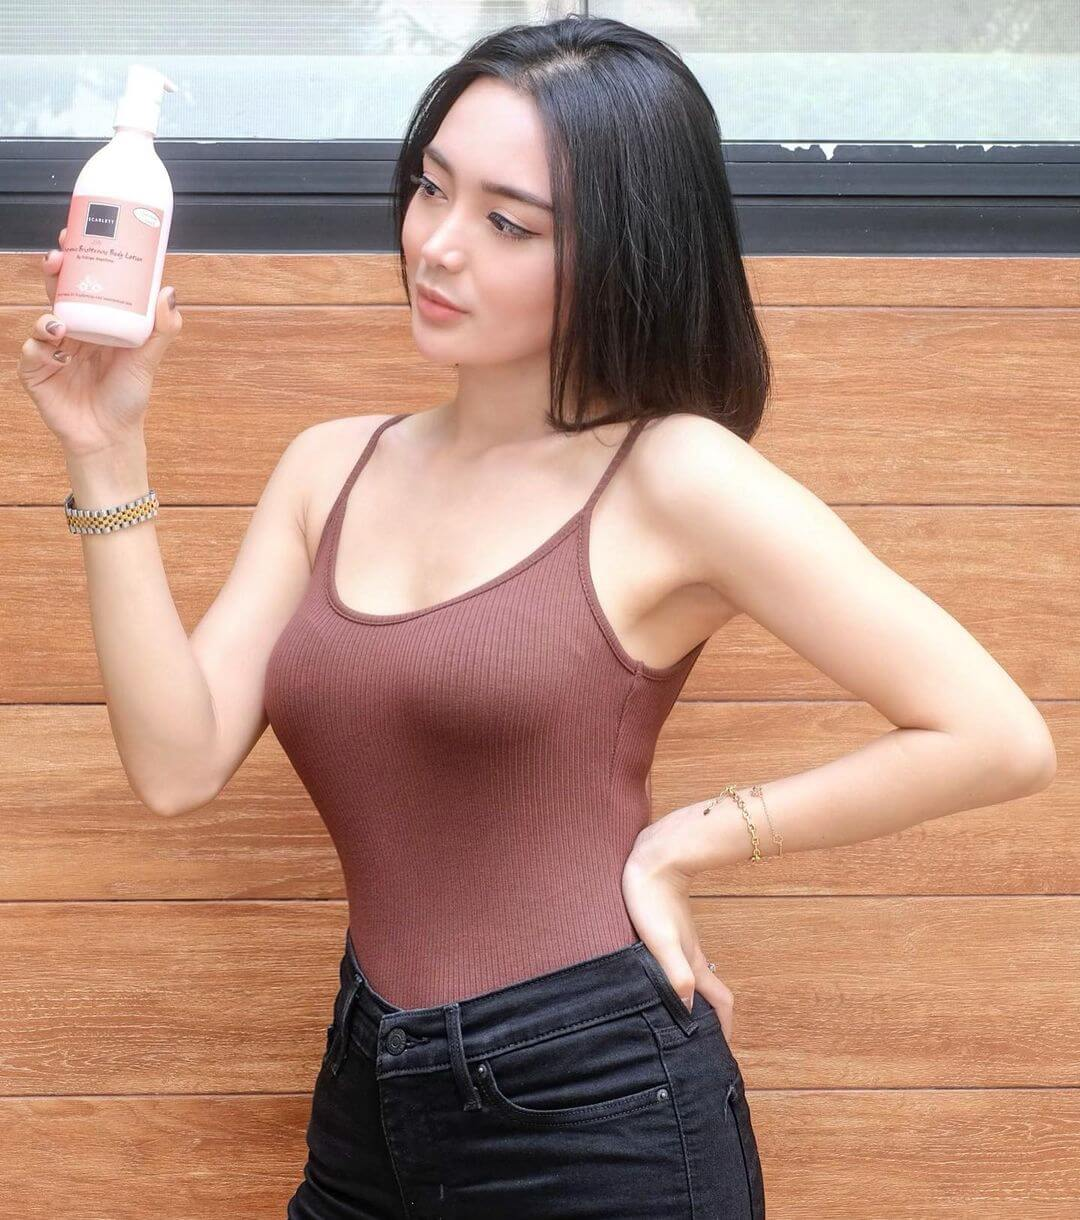 Pretty Indonesian Actress Wika Salim